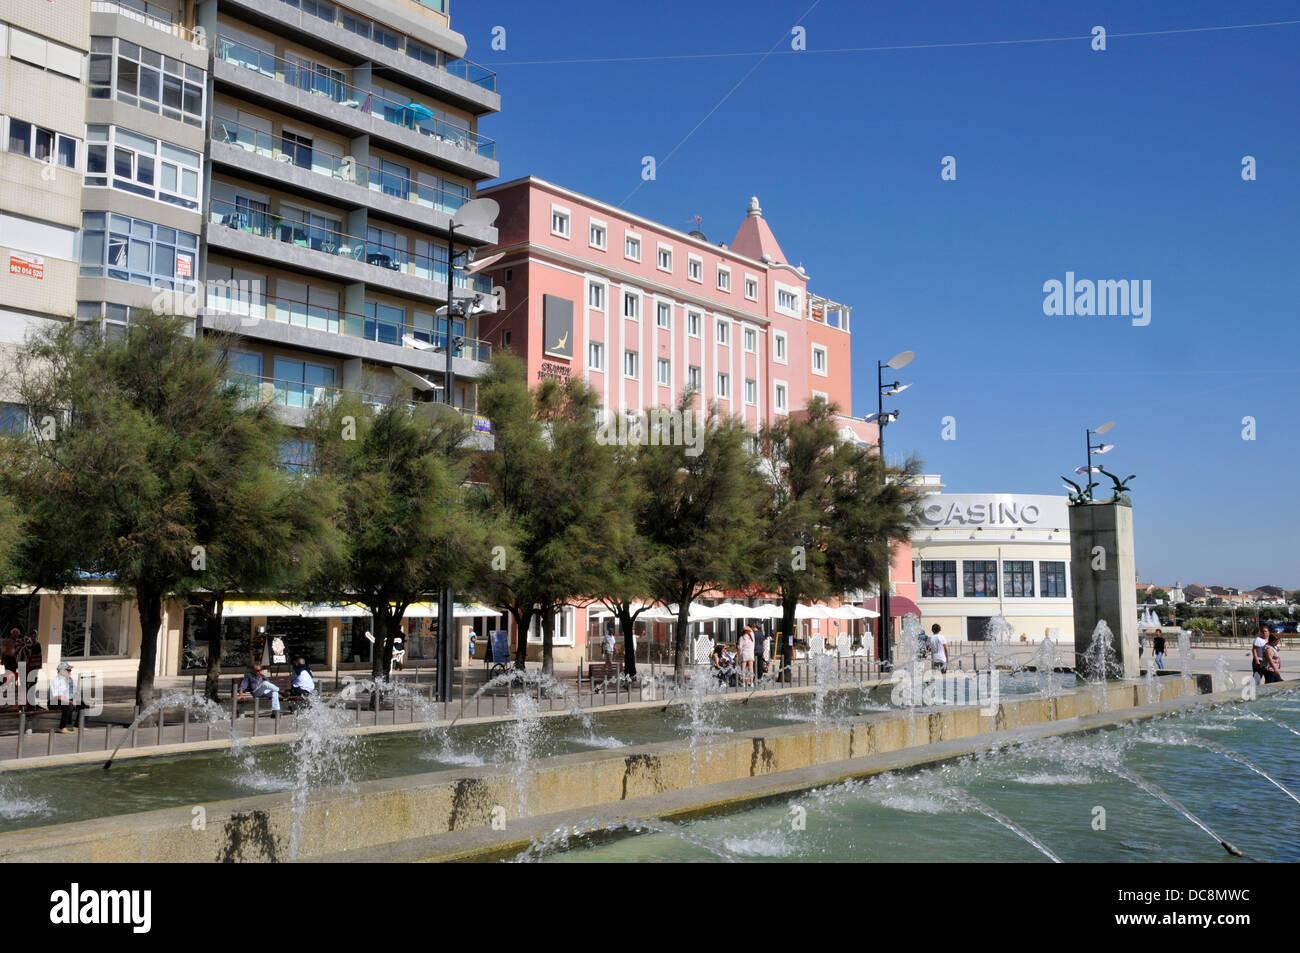 Póvoa de Varzim, Portugal: Passeio Alegre, Grande Hotel and Casino - Stock Image